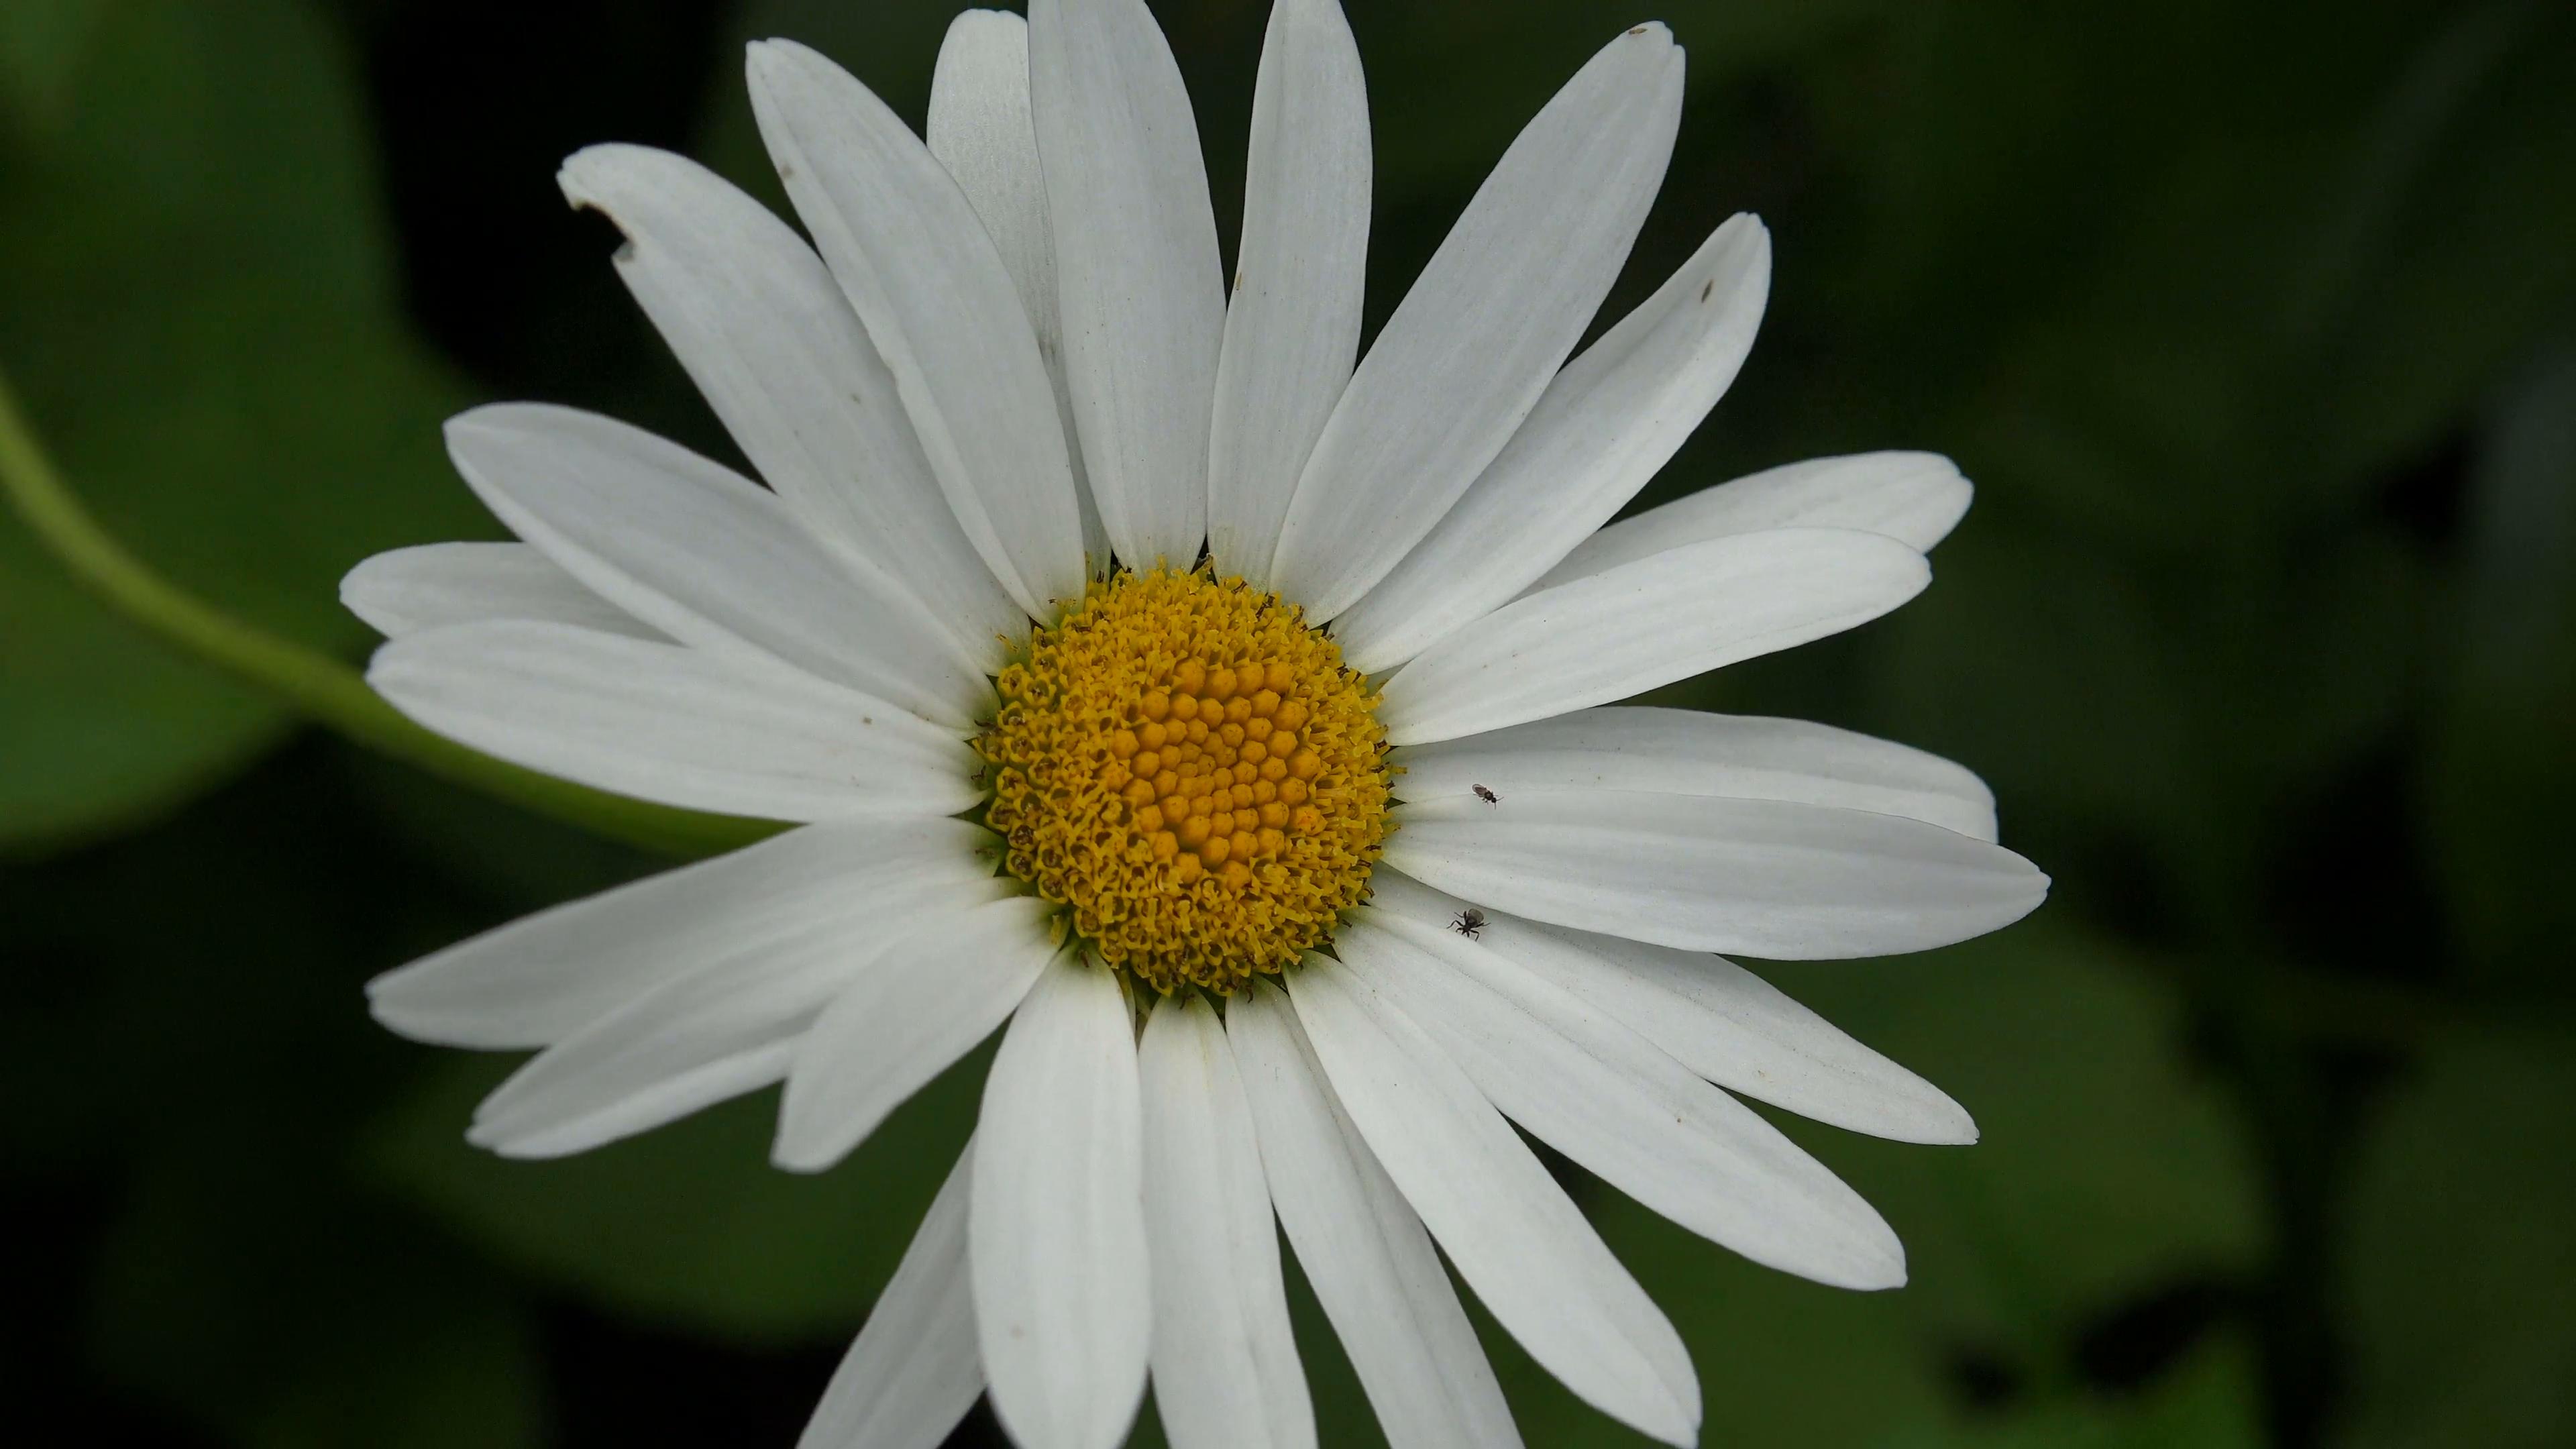 White daisy. Flower. 4K. Stock Video Footage - Videoblocks